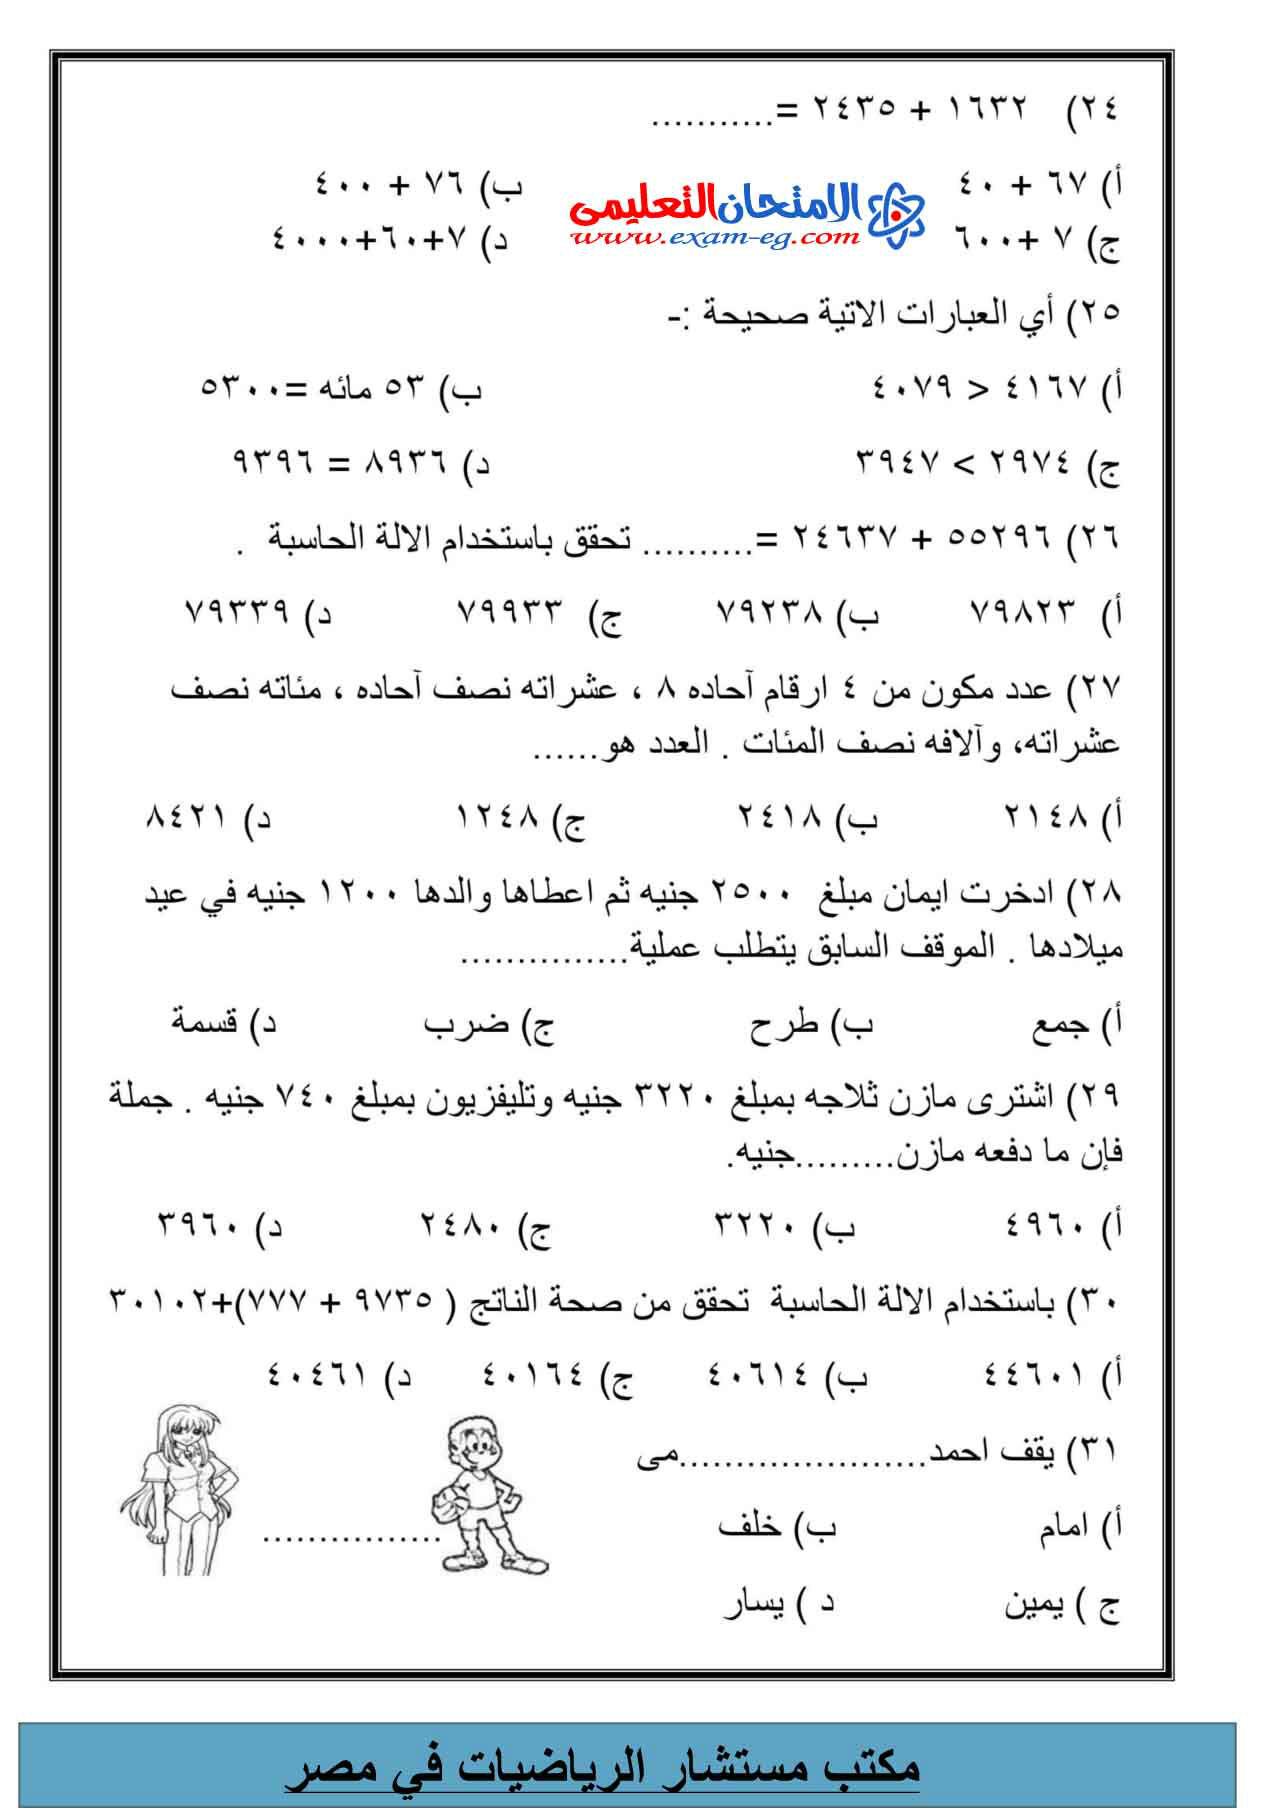 exam-eg.com_1449242034635.jpg